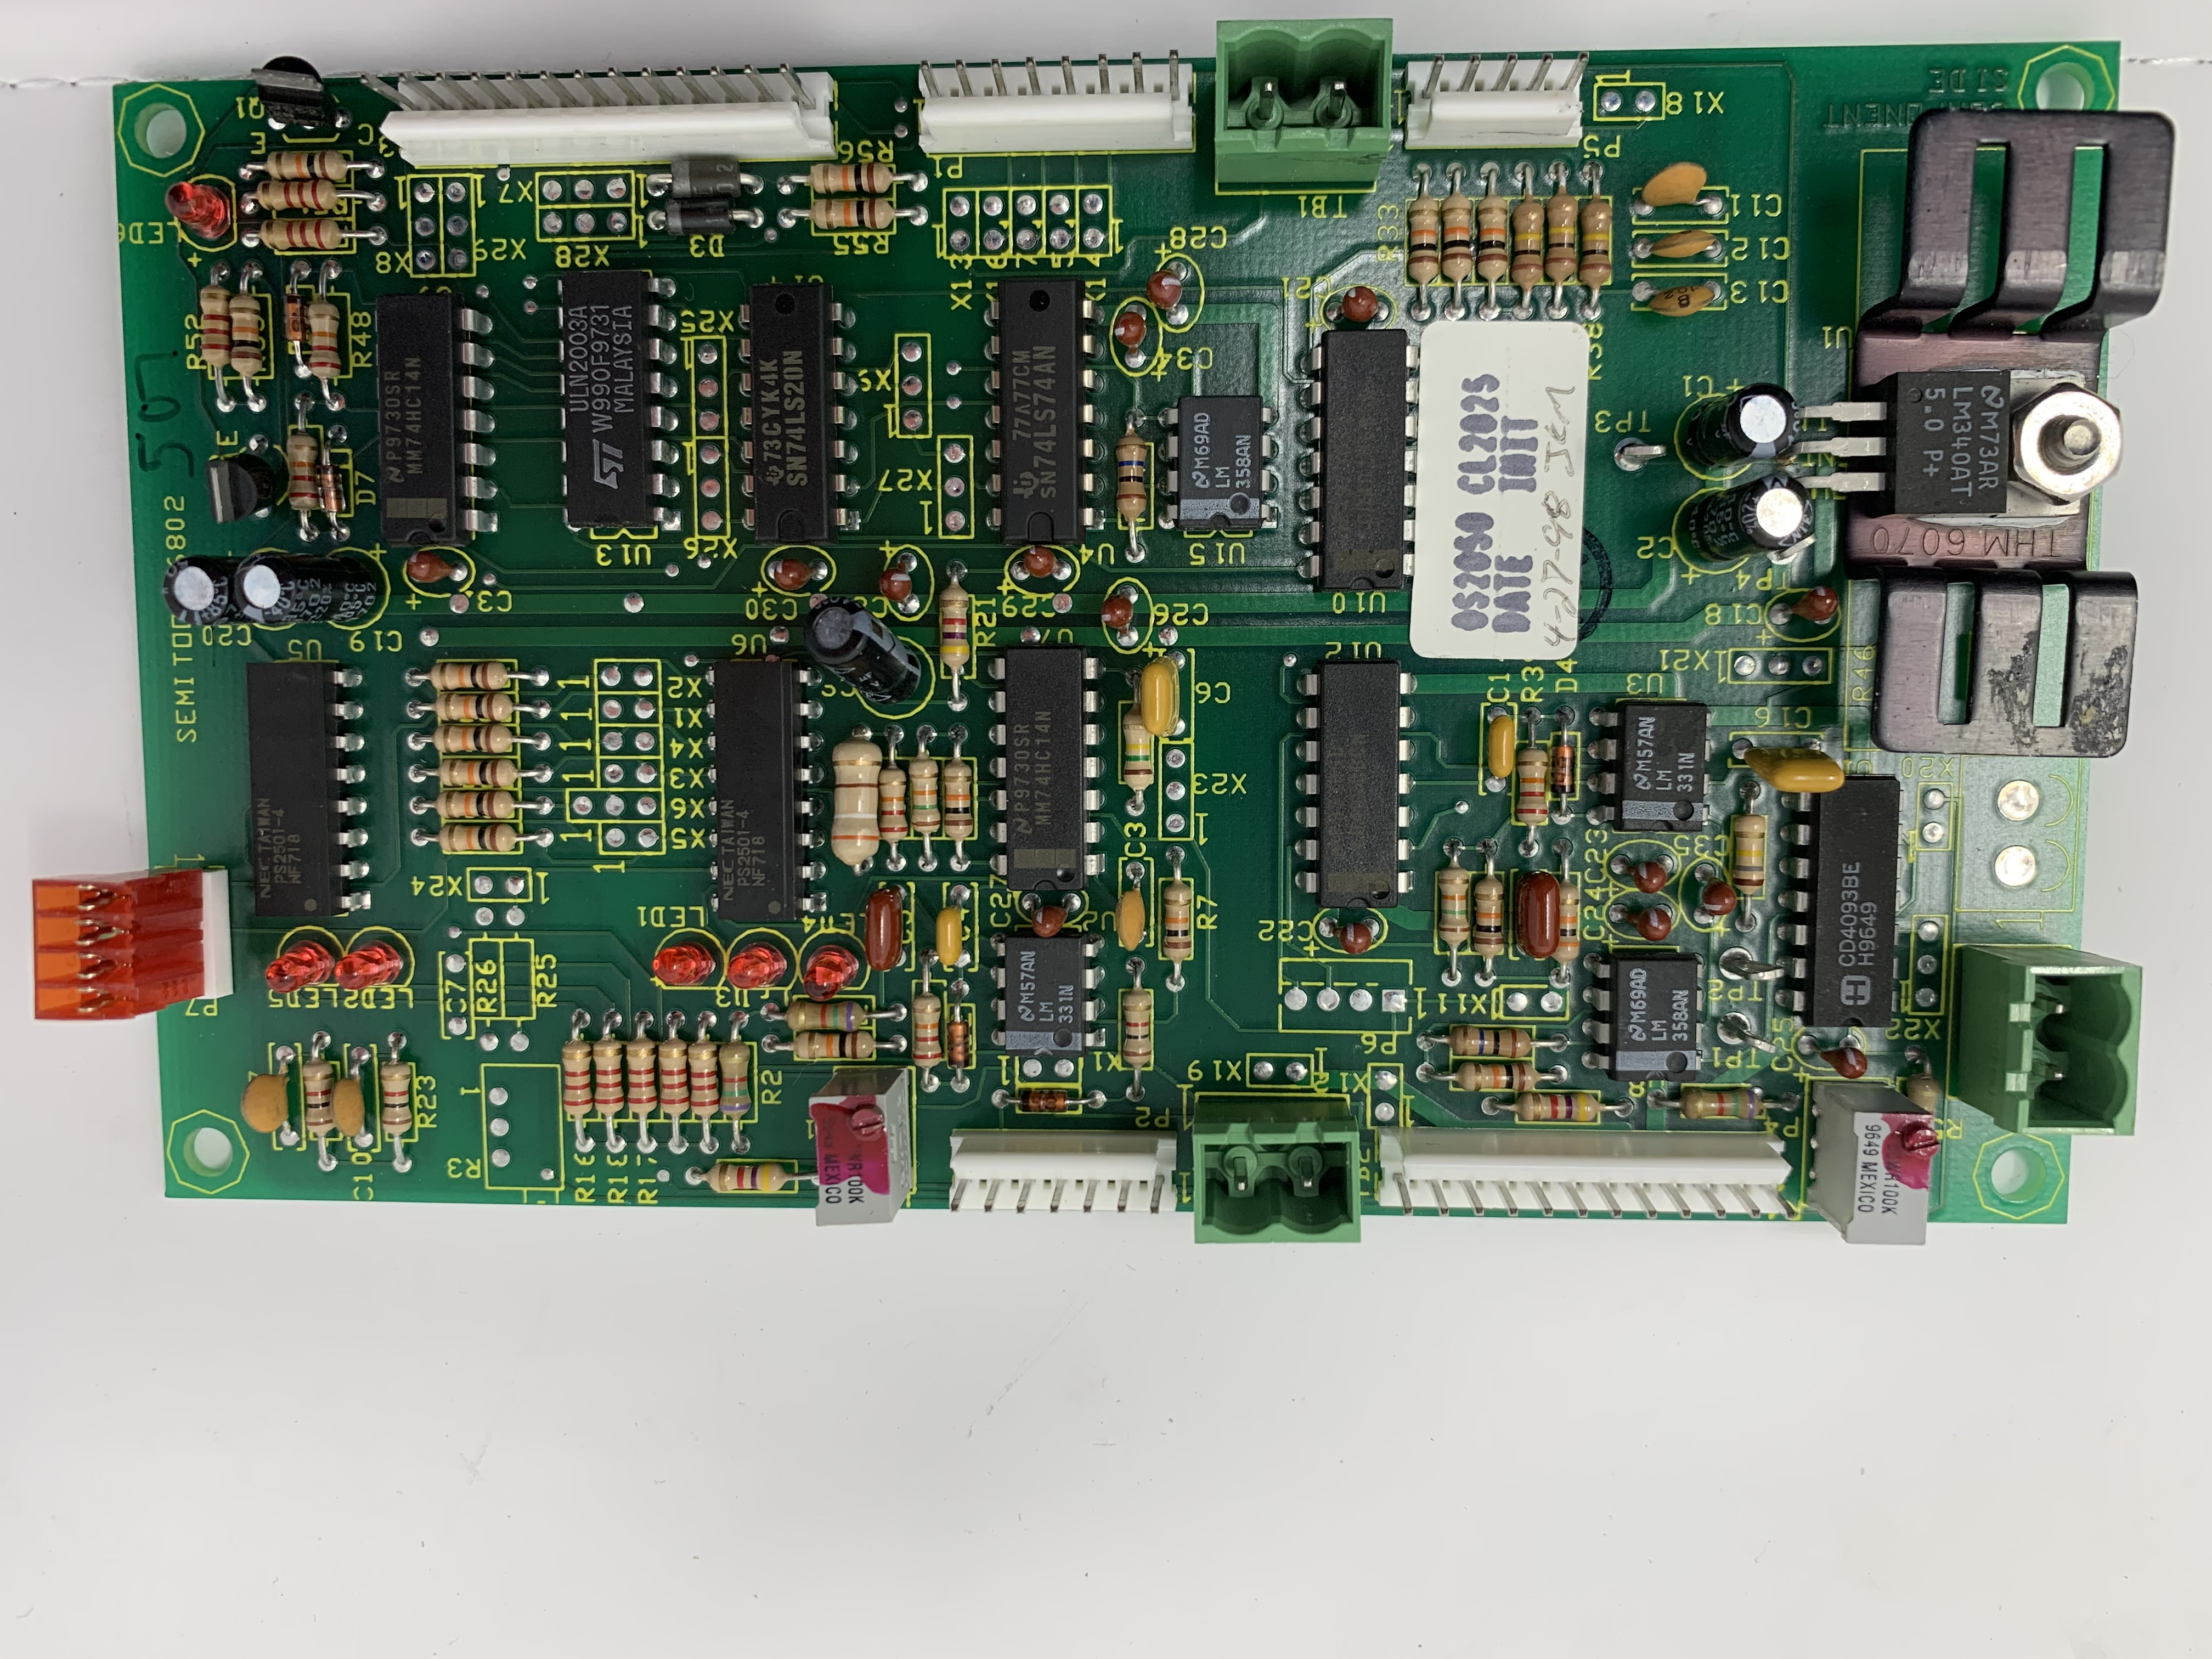 BRD ASSY SPEED LMTR SST (280/2300)